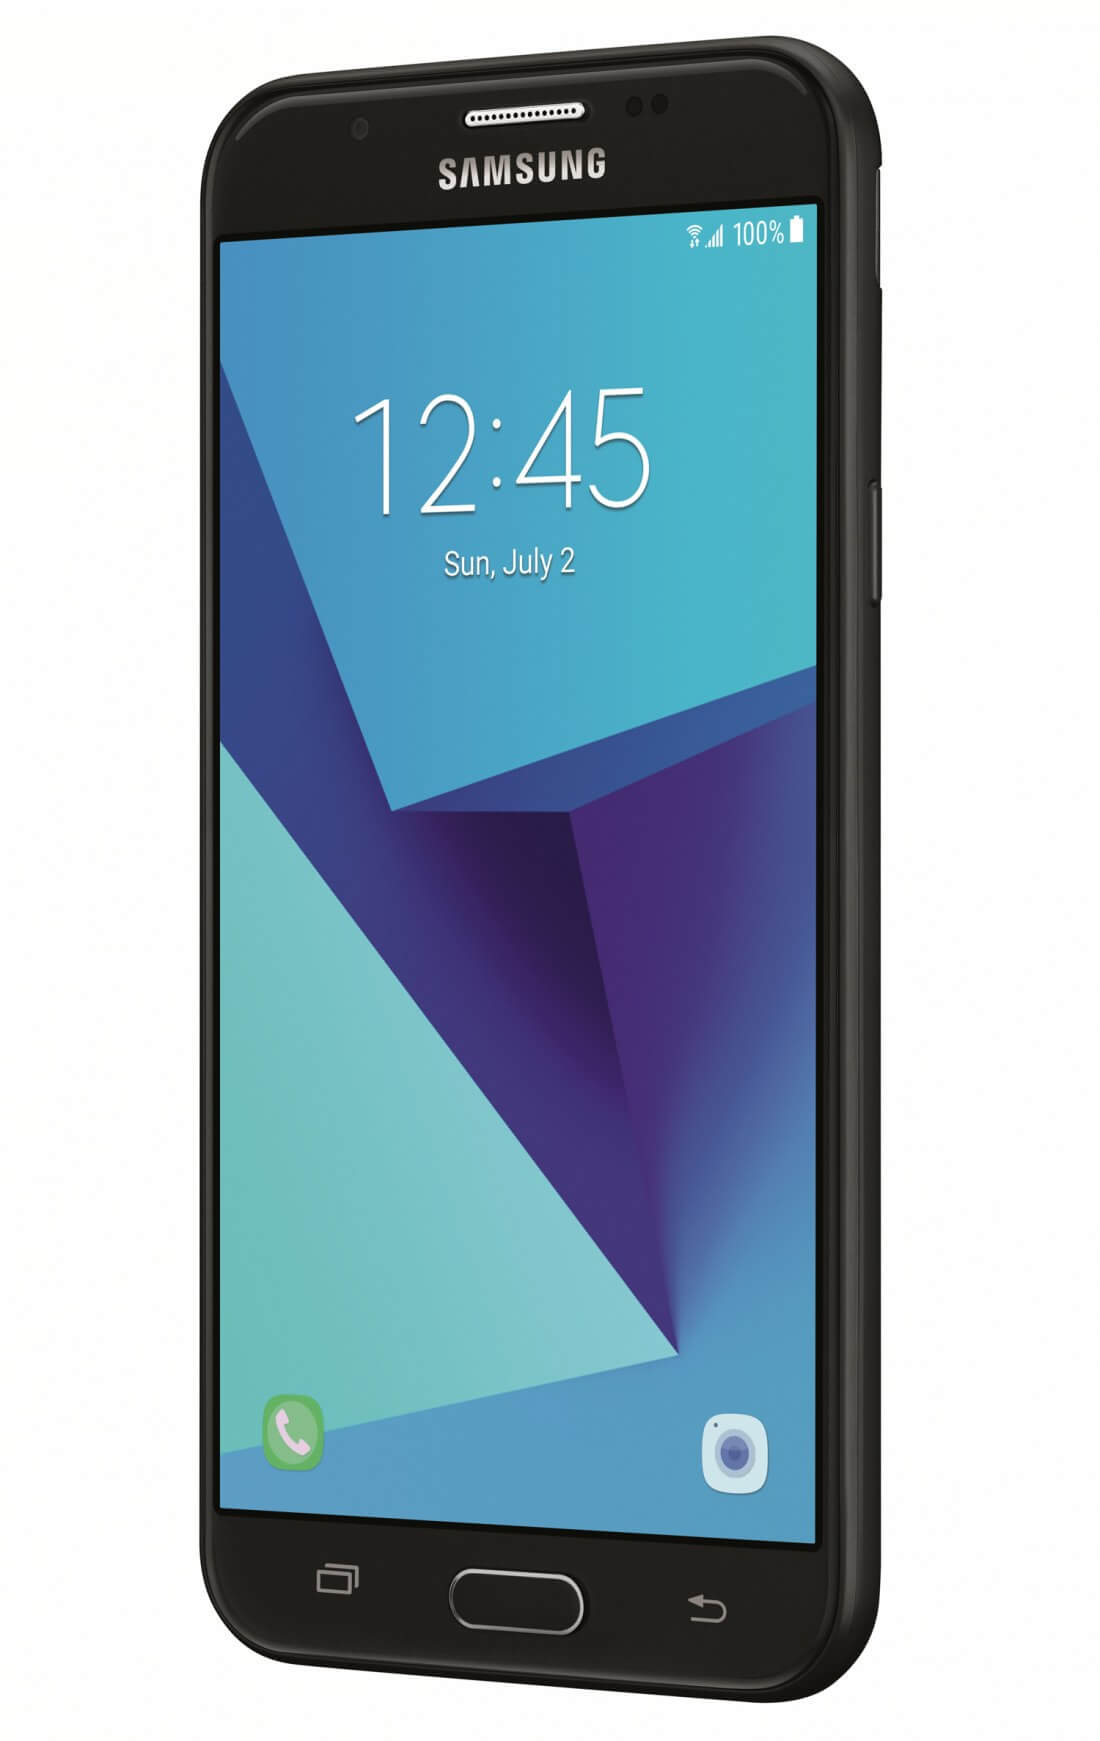 Samsung Galaxy J3 (2017) Reviews and Ratings - TechSpot